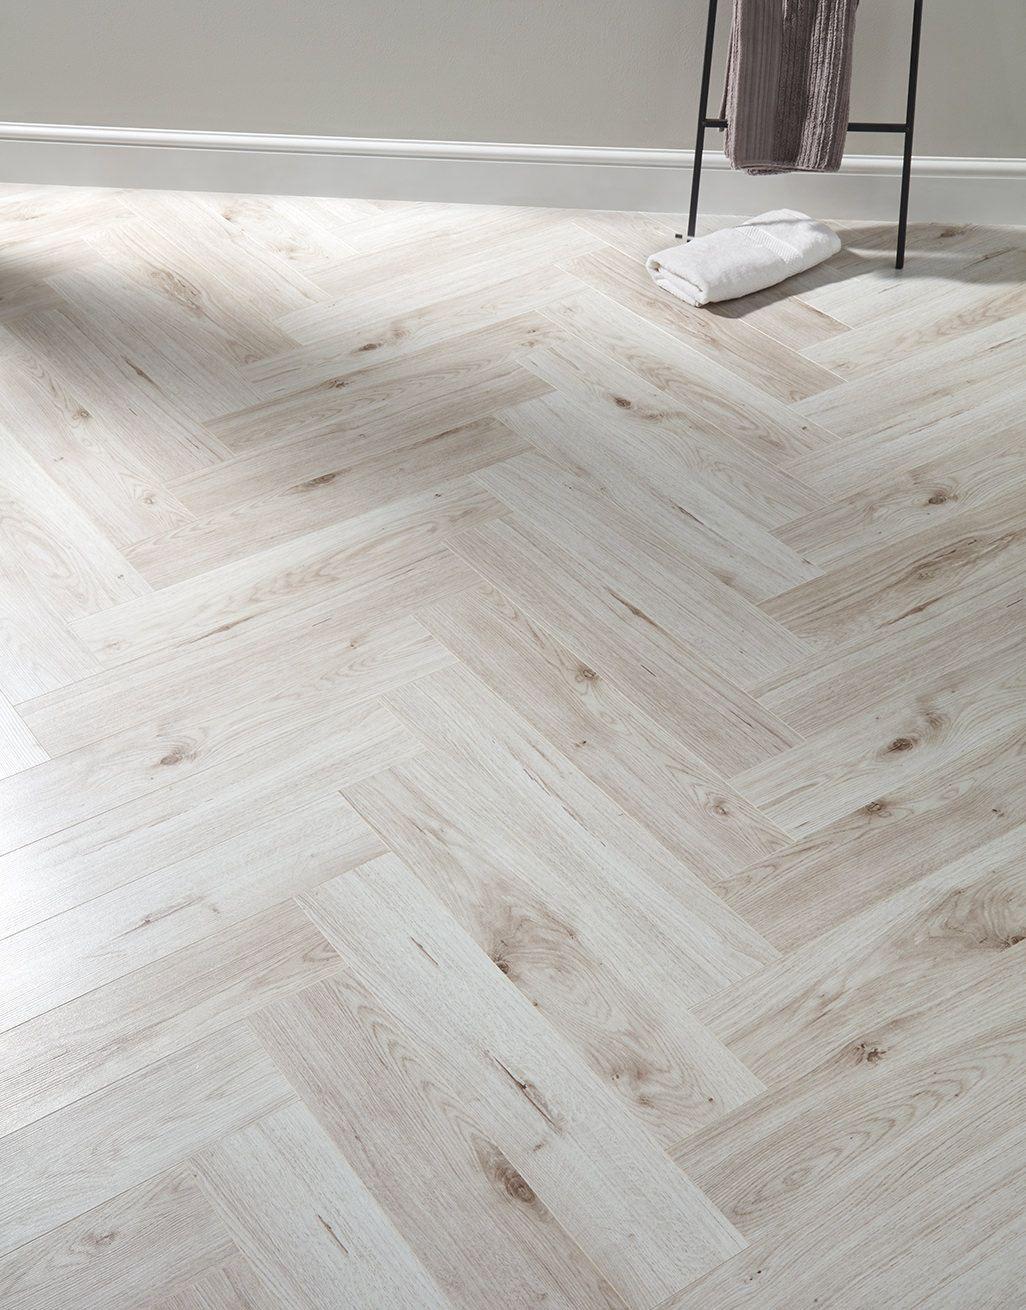 Pearl Oak Laminate Flooring, White Herringbone Laminate Flooring